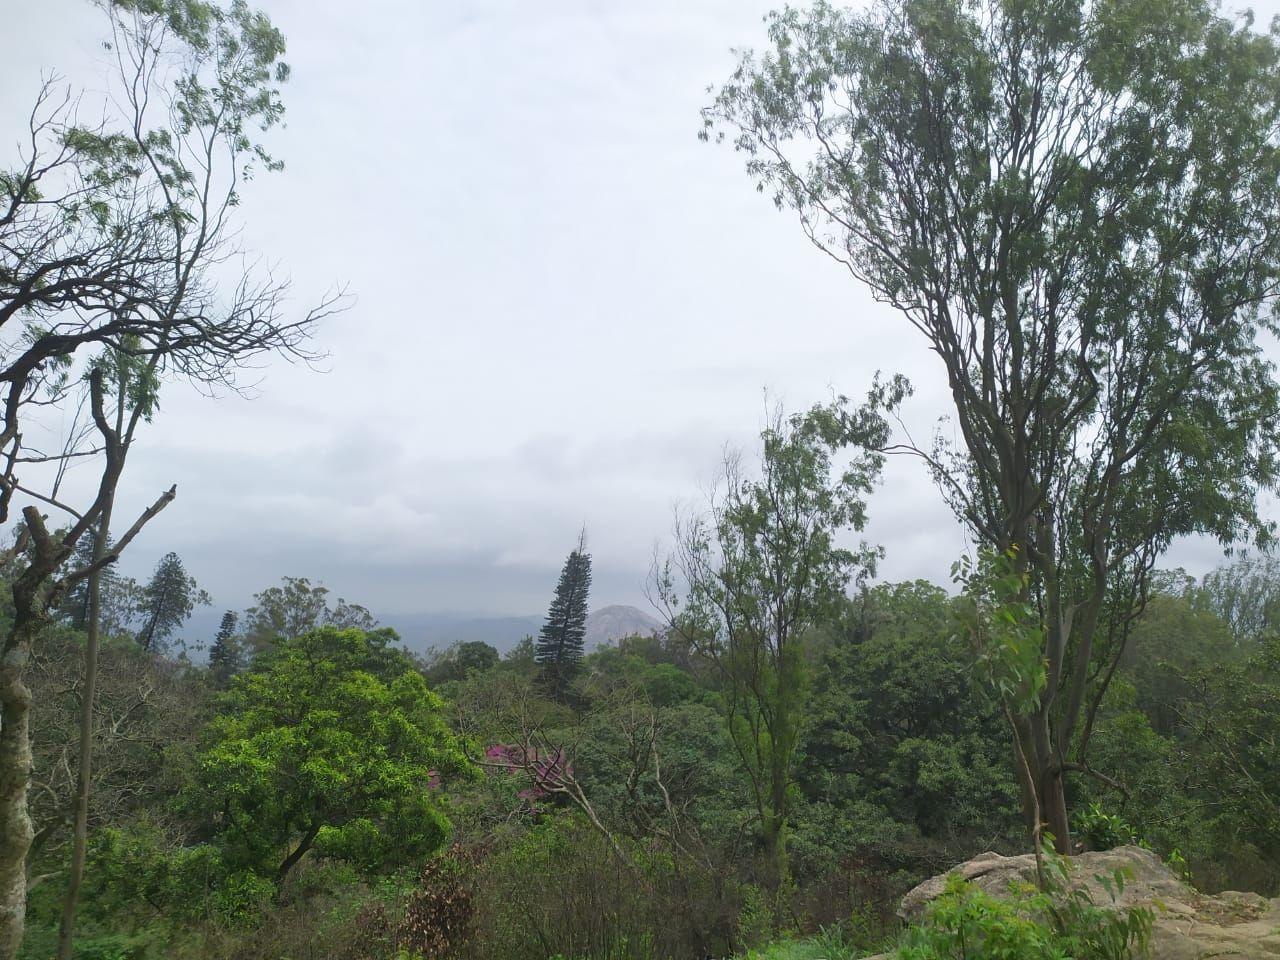 Photo of Nandi Hills By Poonam Talukdar